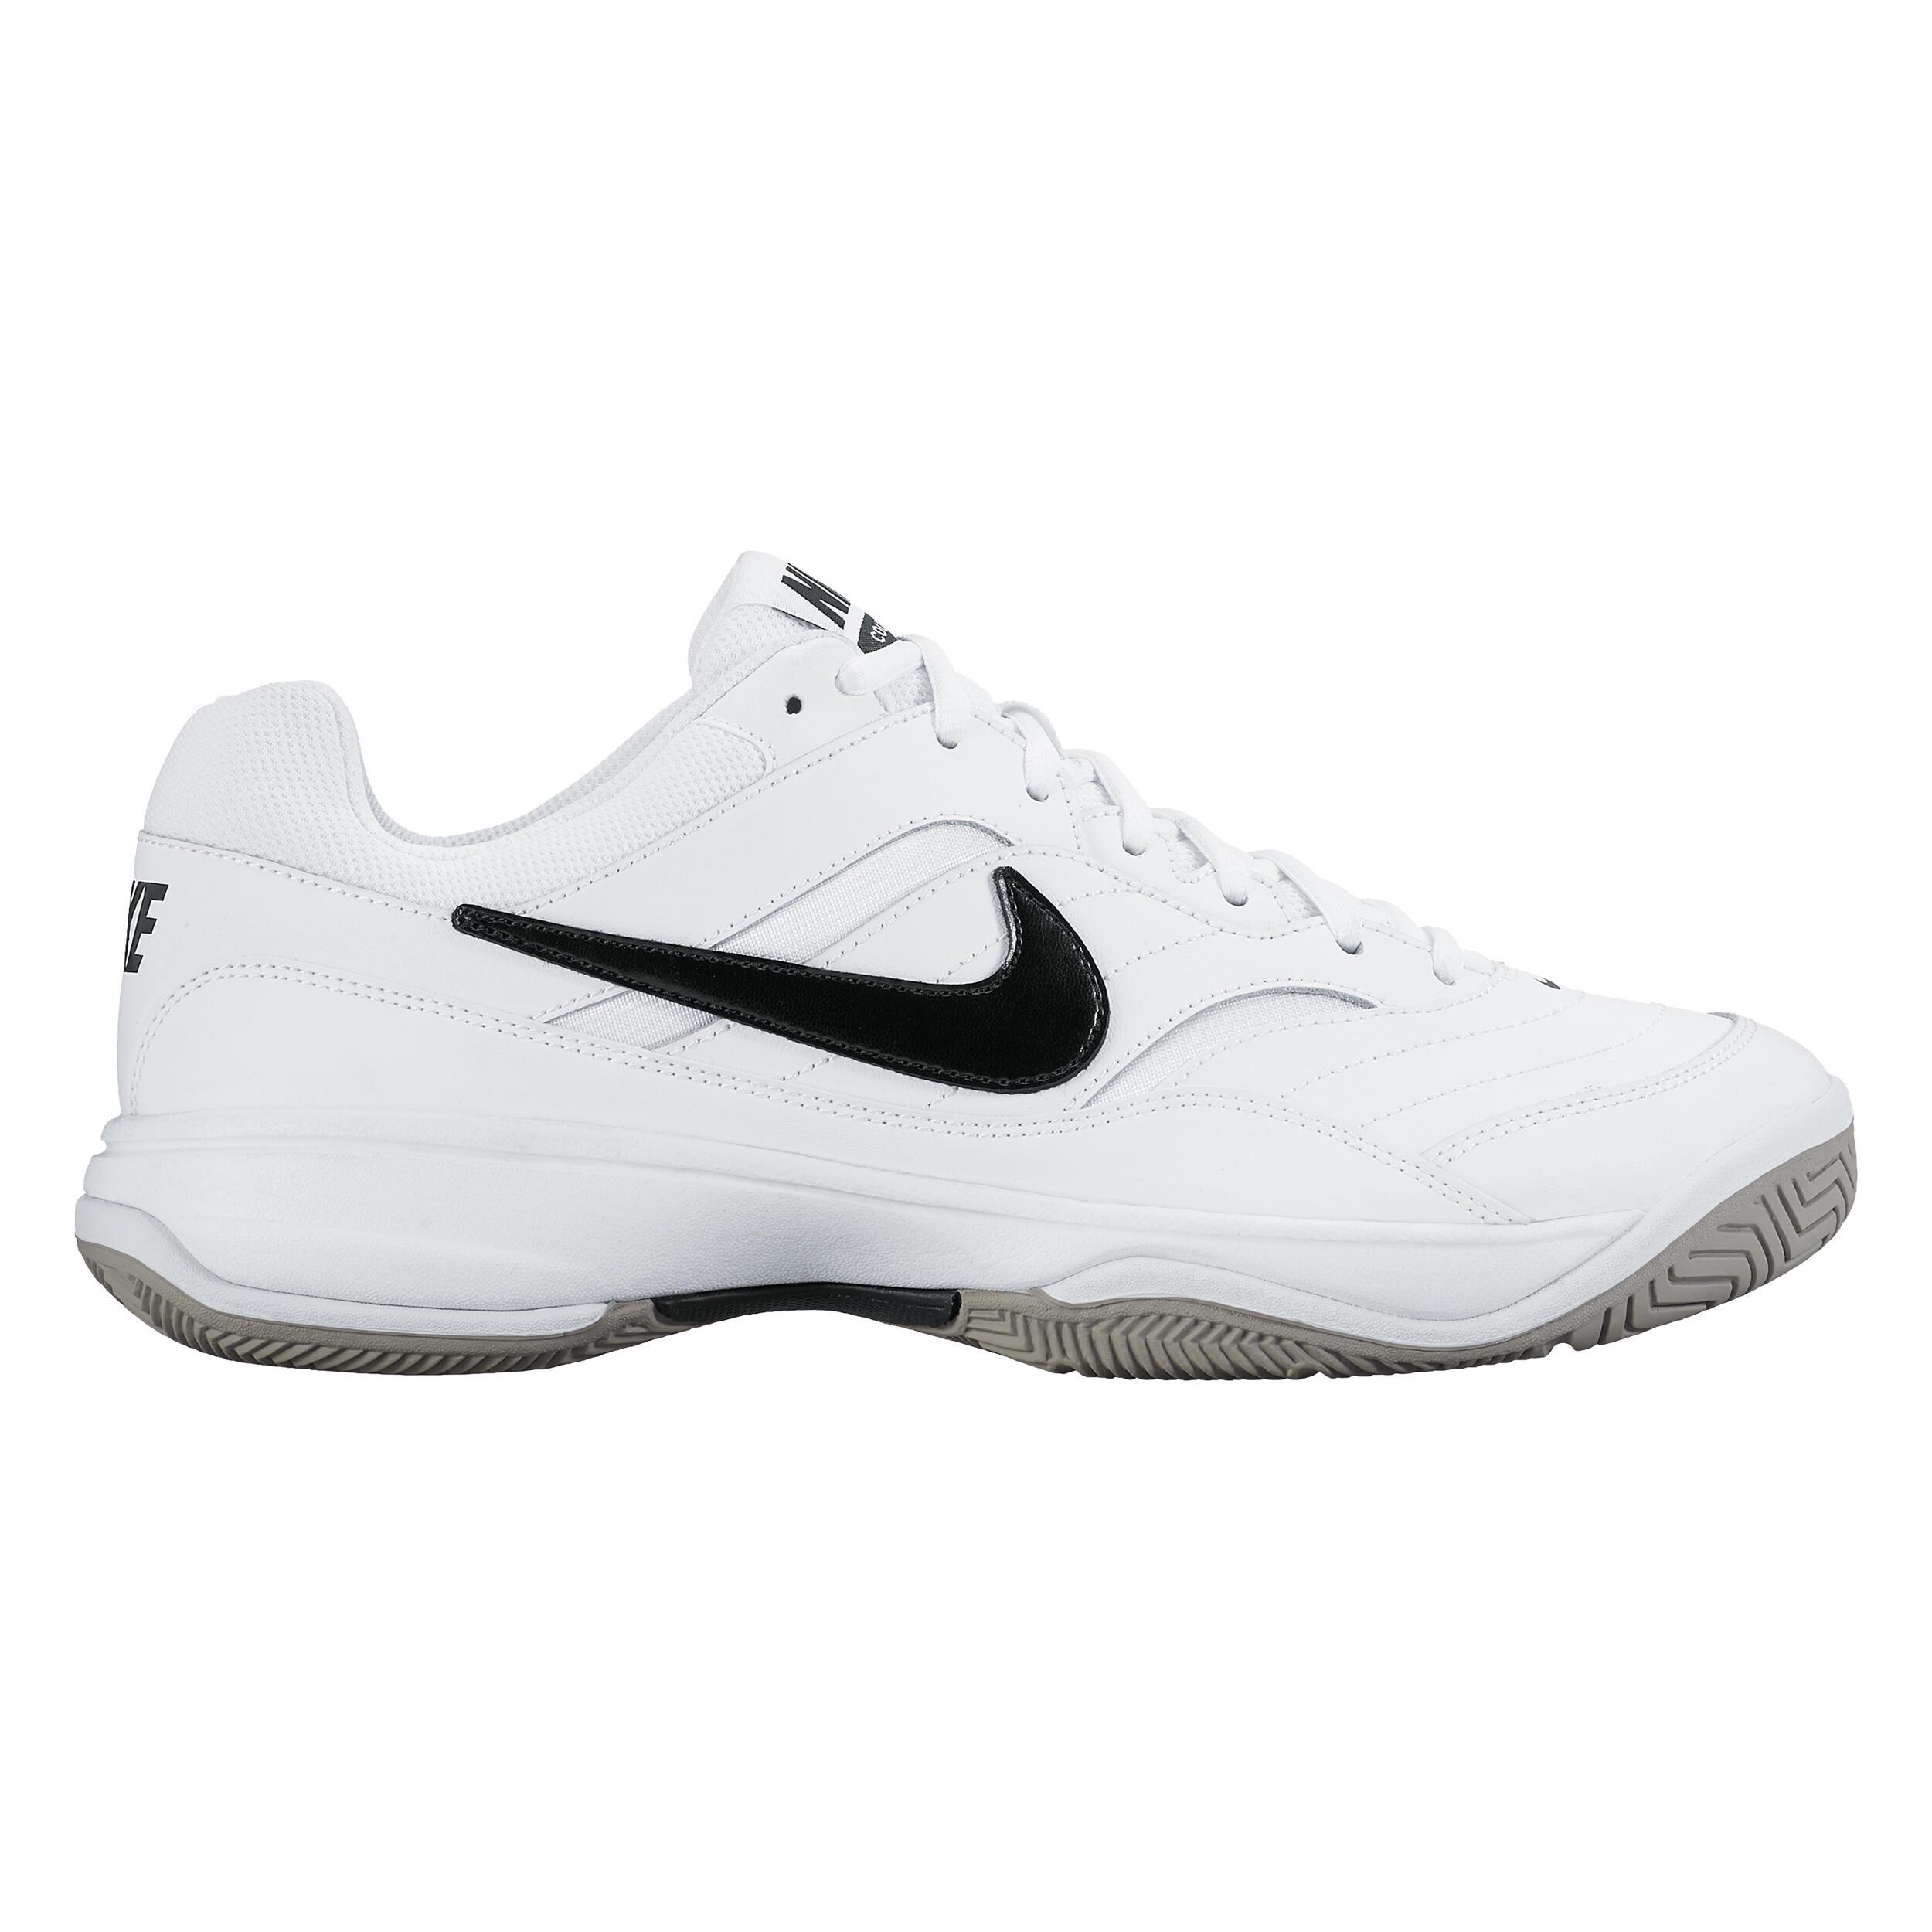 new arrival 0d8b0 a56f9 Nike CHAUSSURE DE TENNIS HOMME COURT LITE BLANC MULTI COURT   Decathlon